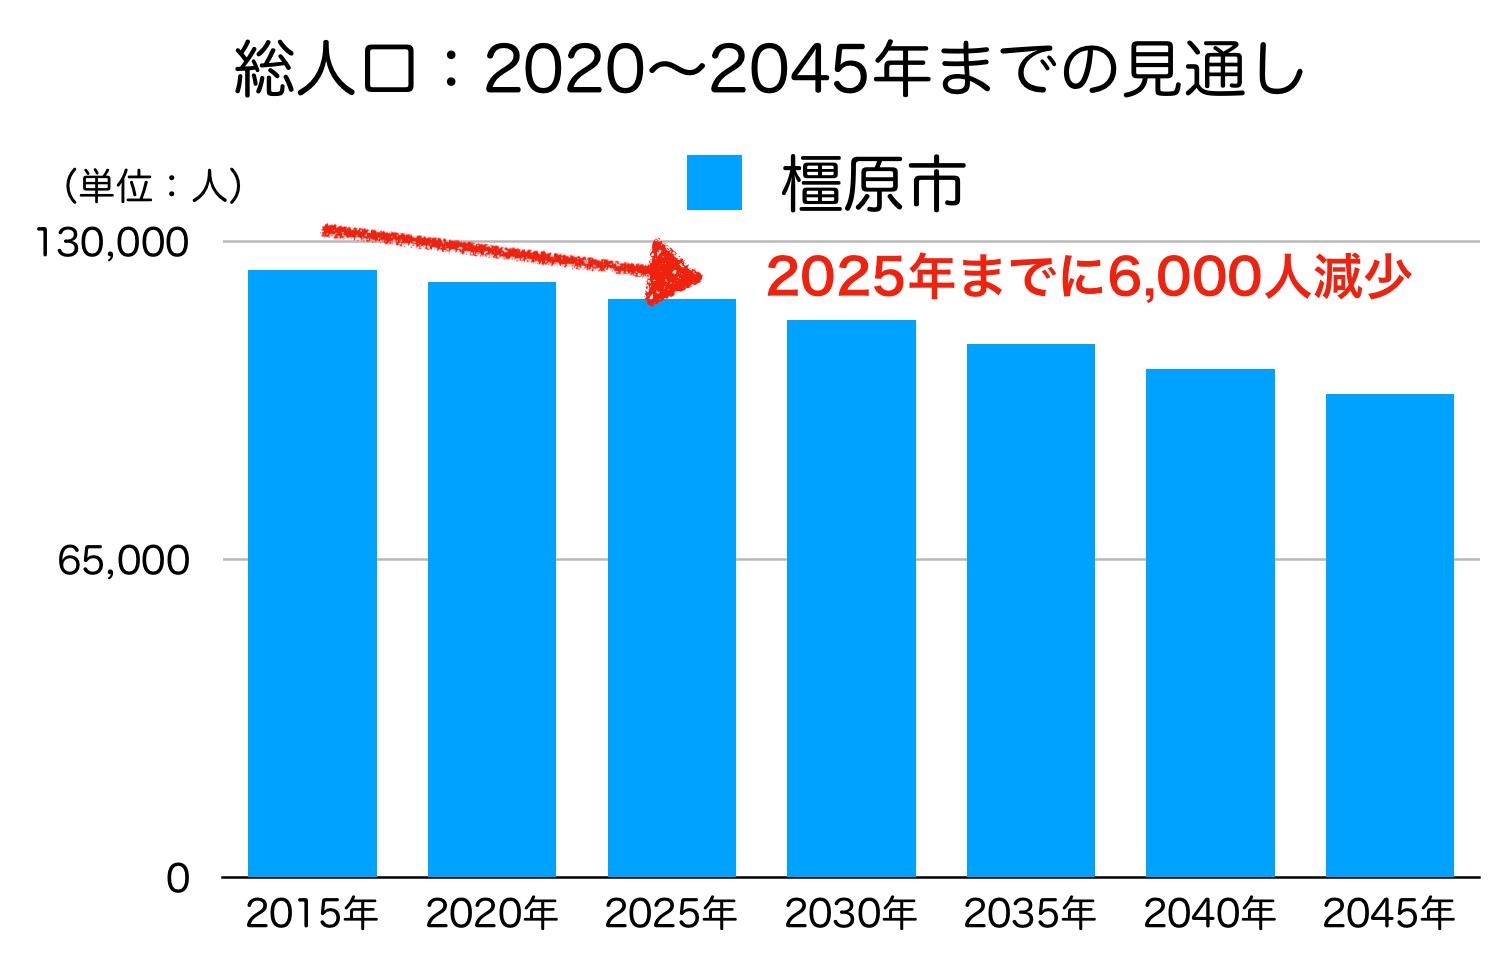 橿原市の人口予測